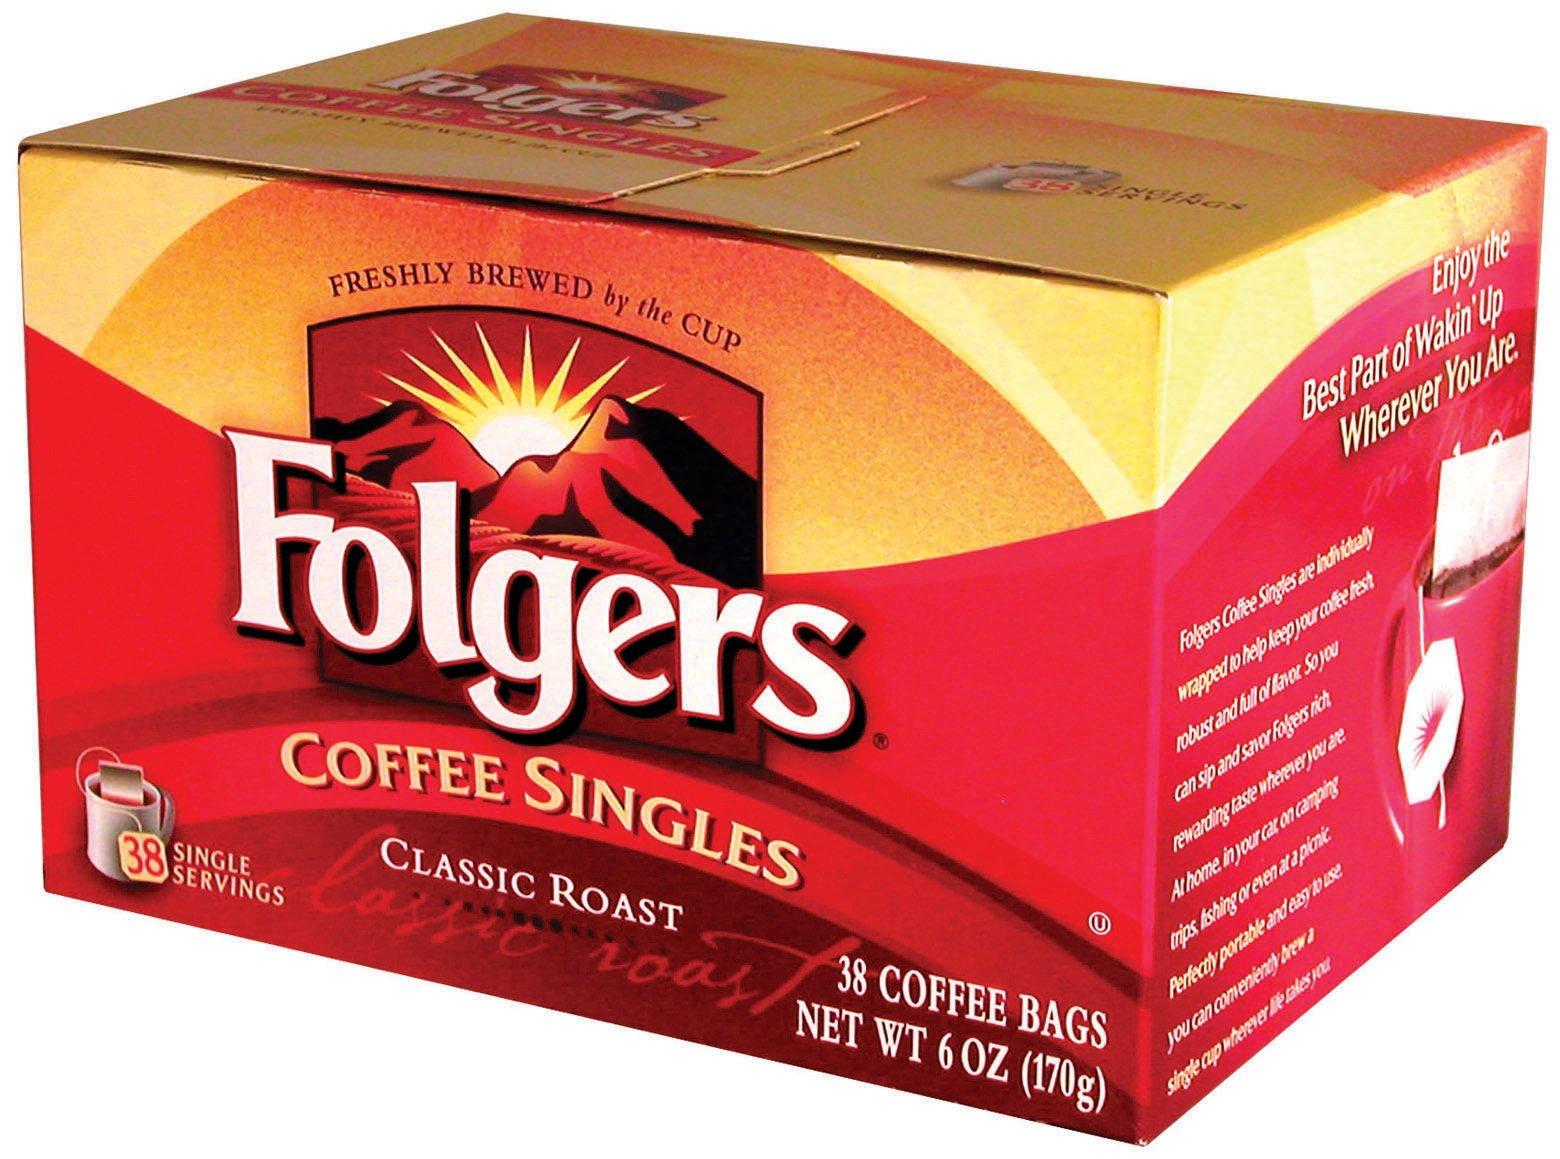 Folgers Coffee Singles Classic Roast, 38 Single Servings (Pack of 2)